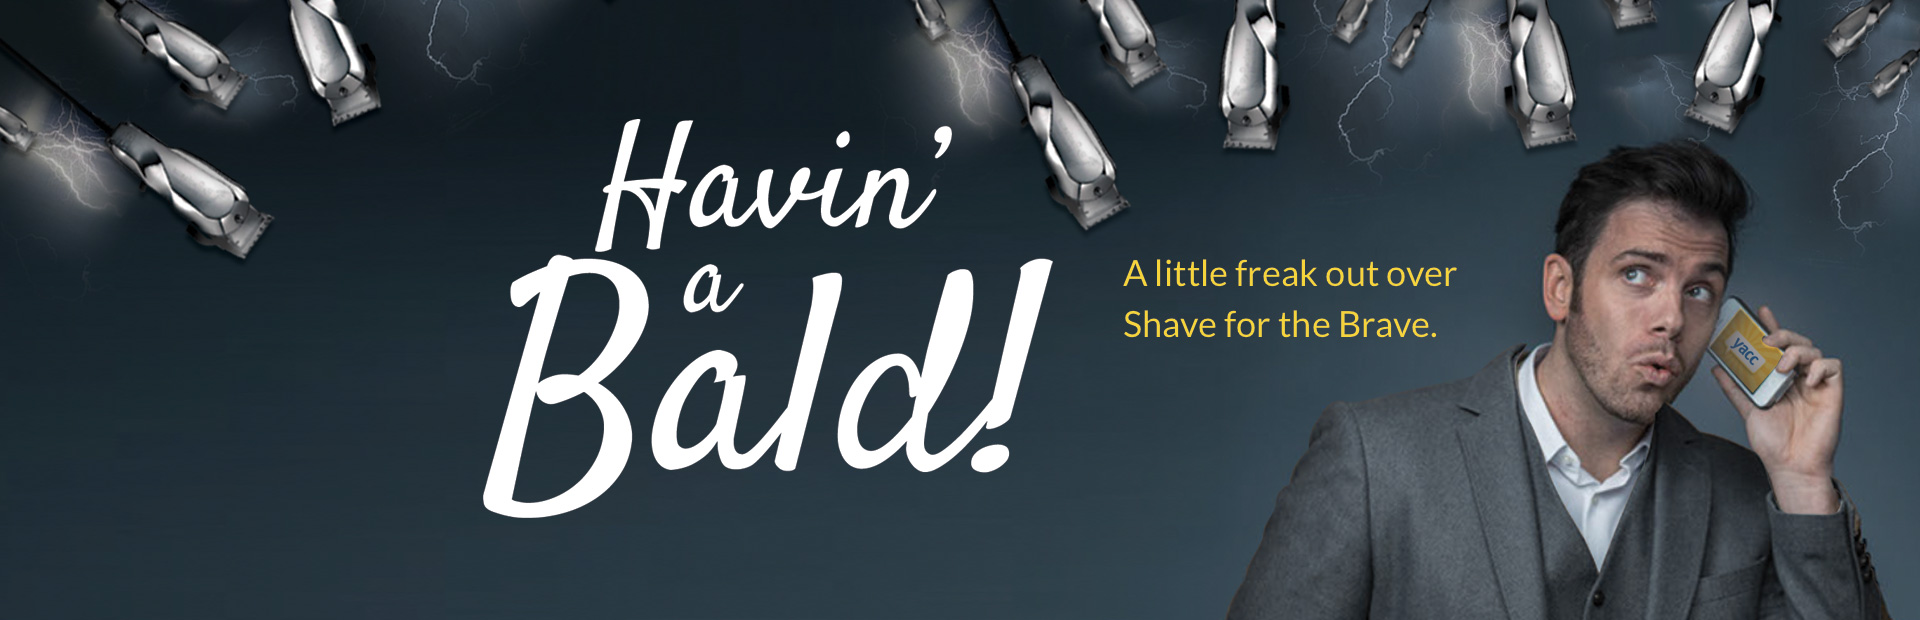 Dc presents: Havin' a Bald